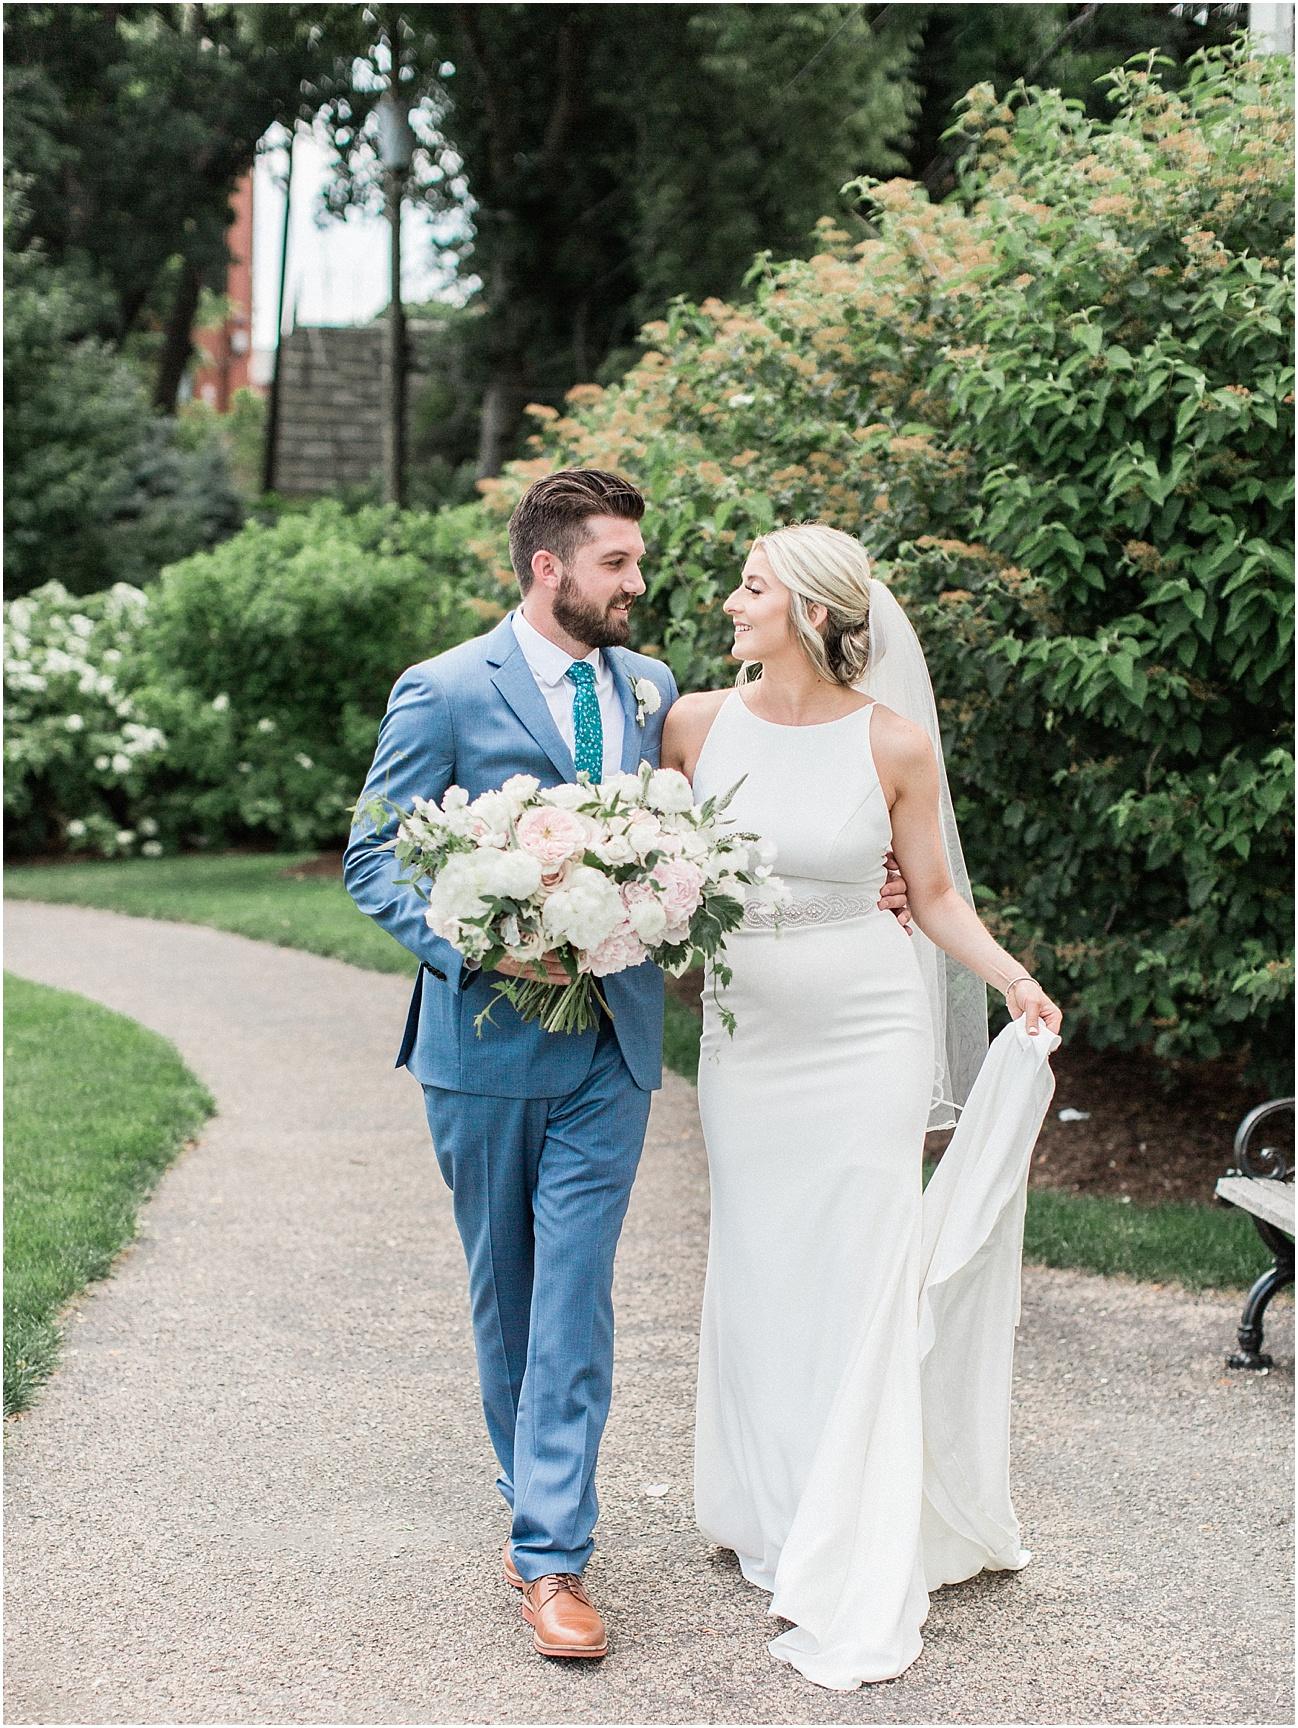 lindsey_paul_indian_pond_country_club_wild_dahlia_brewster_gardens_plymouth_cape_cod_boston_wedding_photographer_meredith_jane_photography_photo_0416.jpg